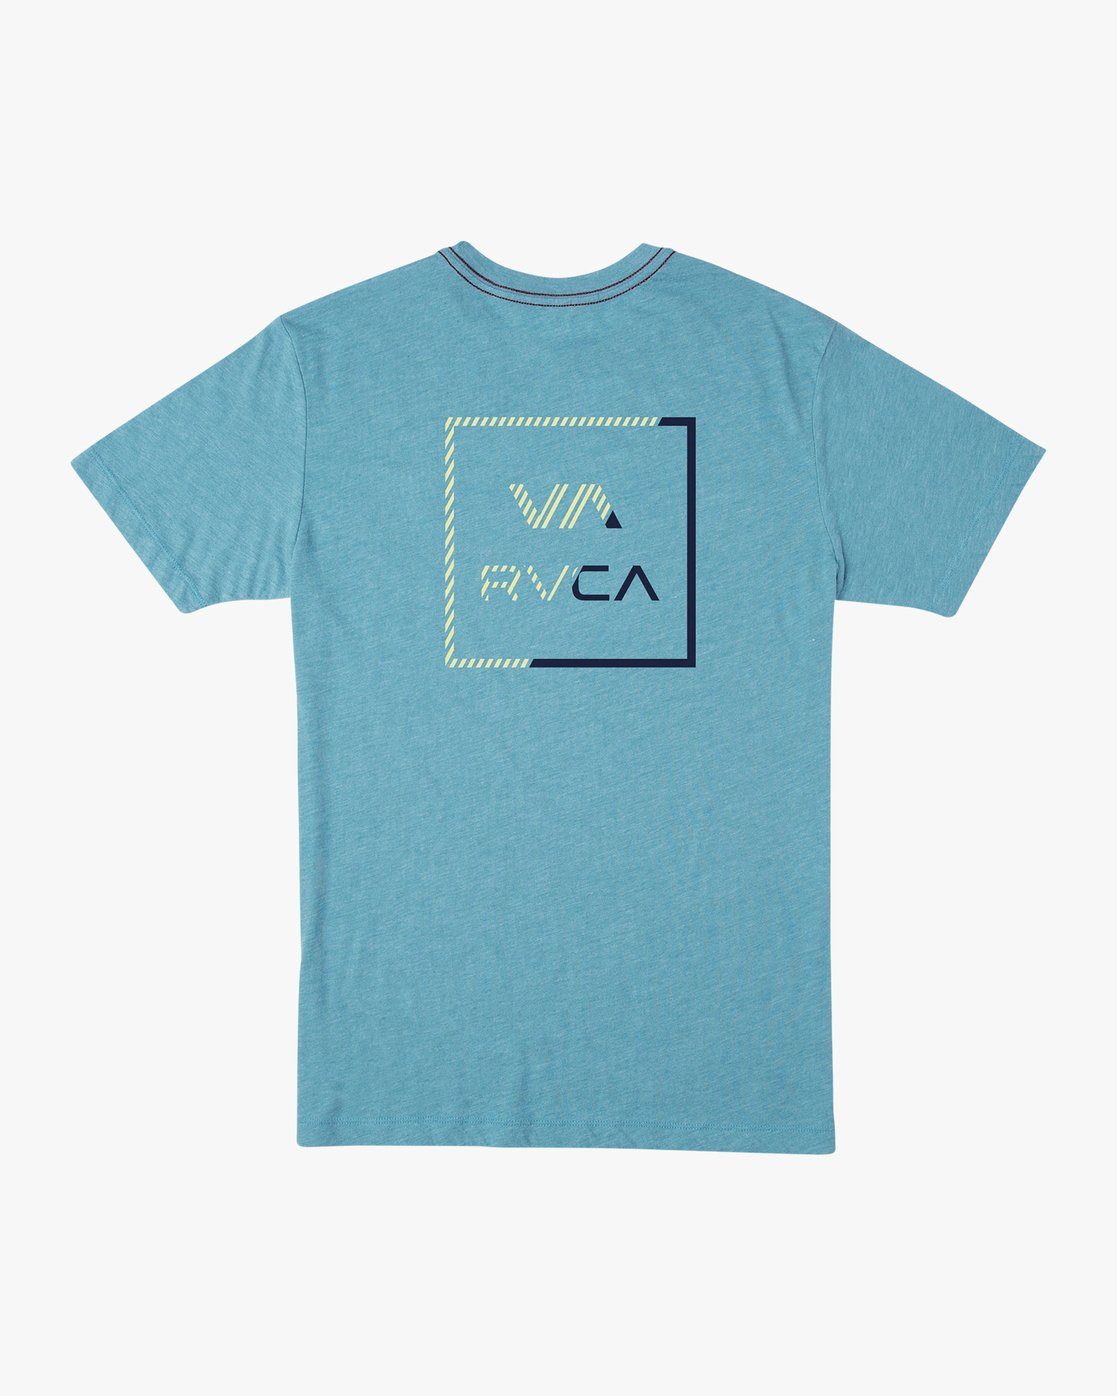 0 Segment T-Shirt Blue M420TRSE RVCA